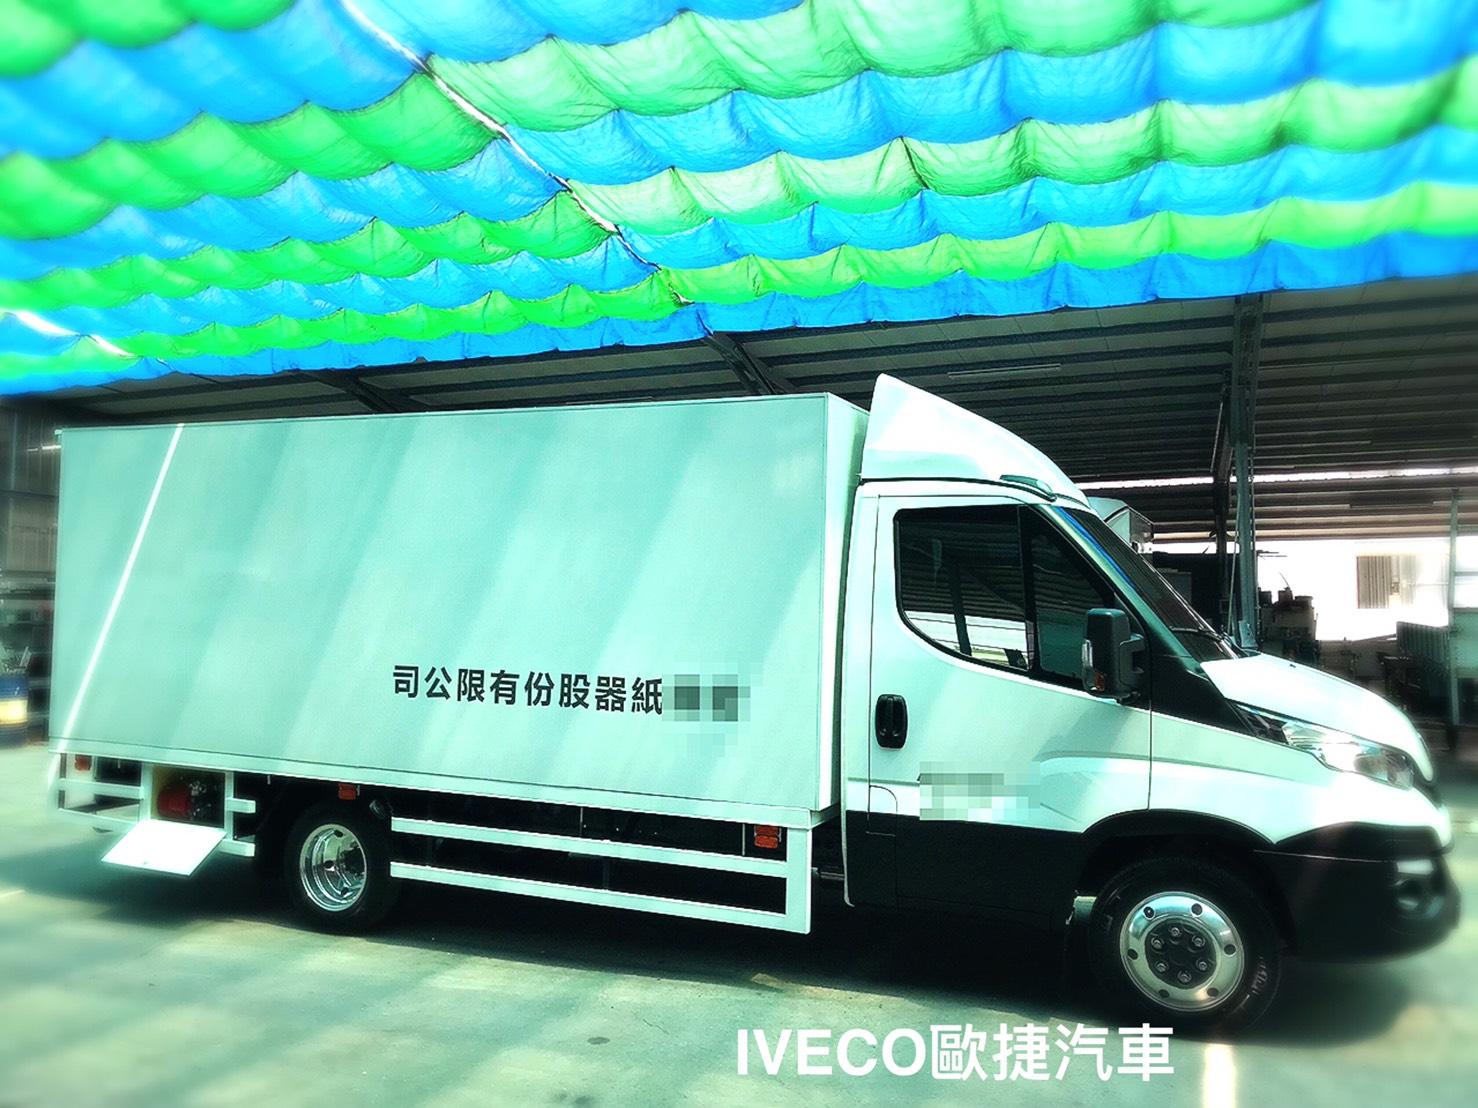 IVECO鋁製貨車車廂